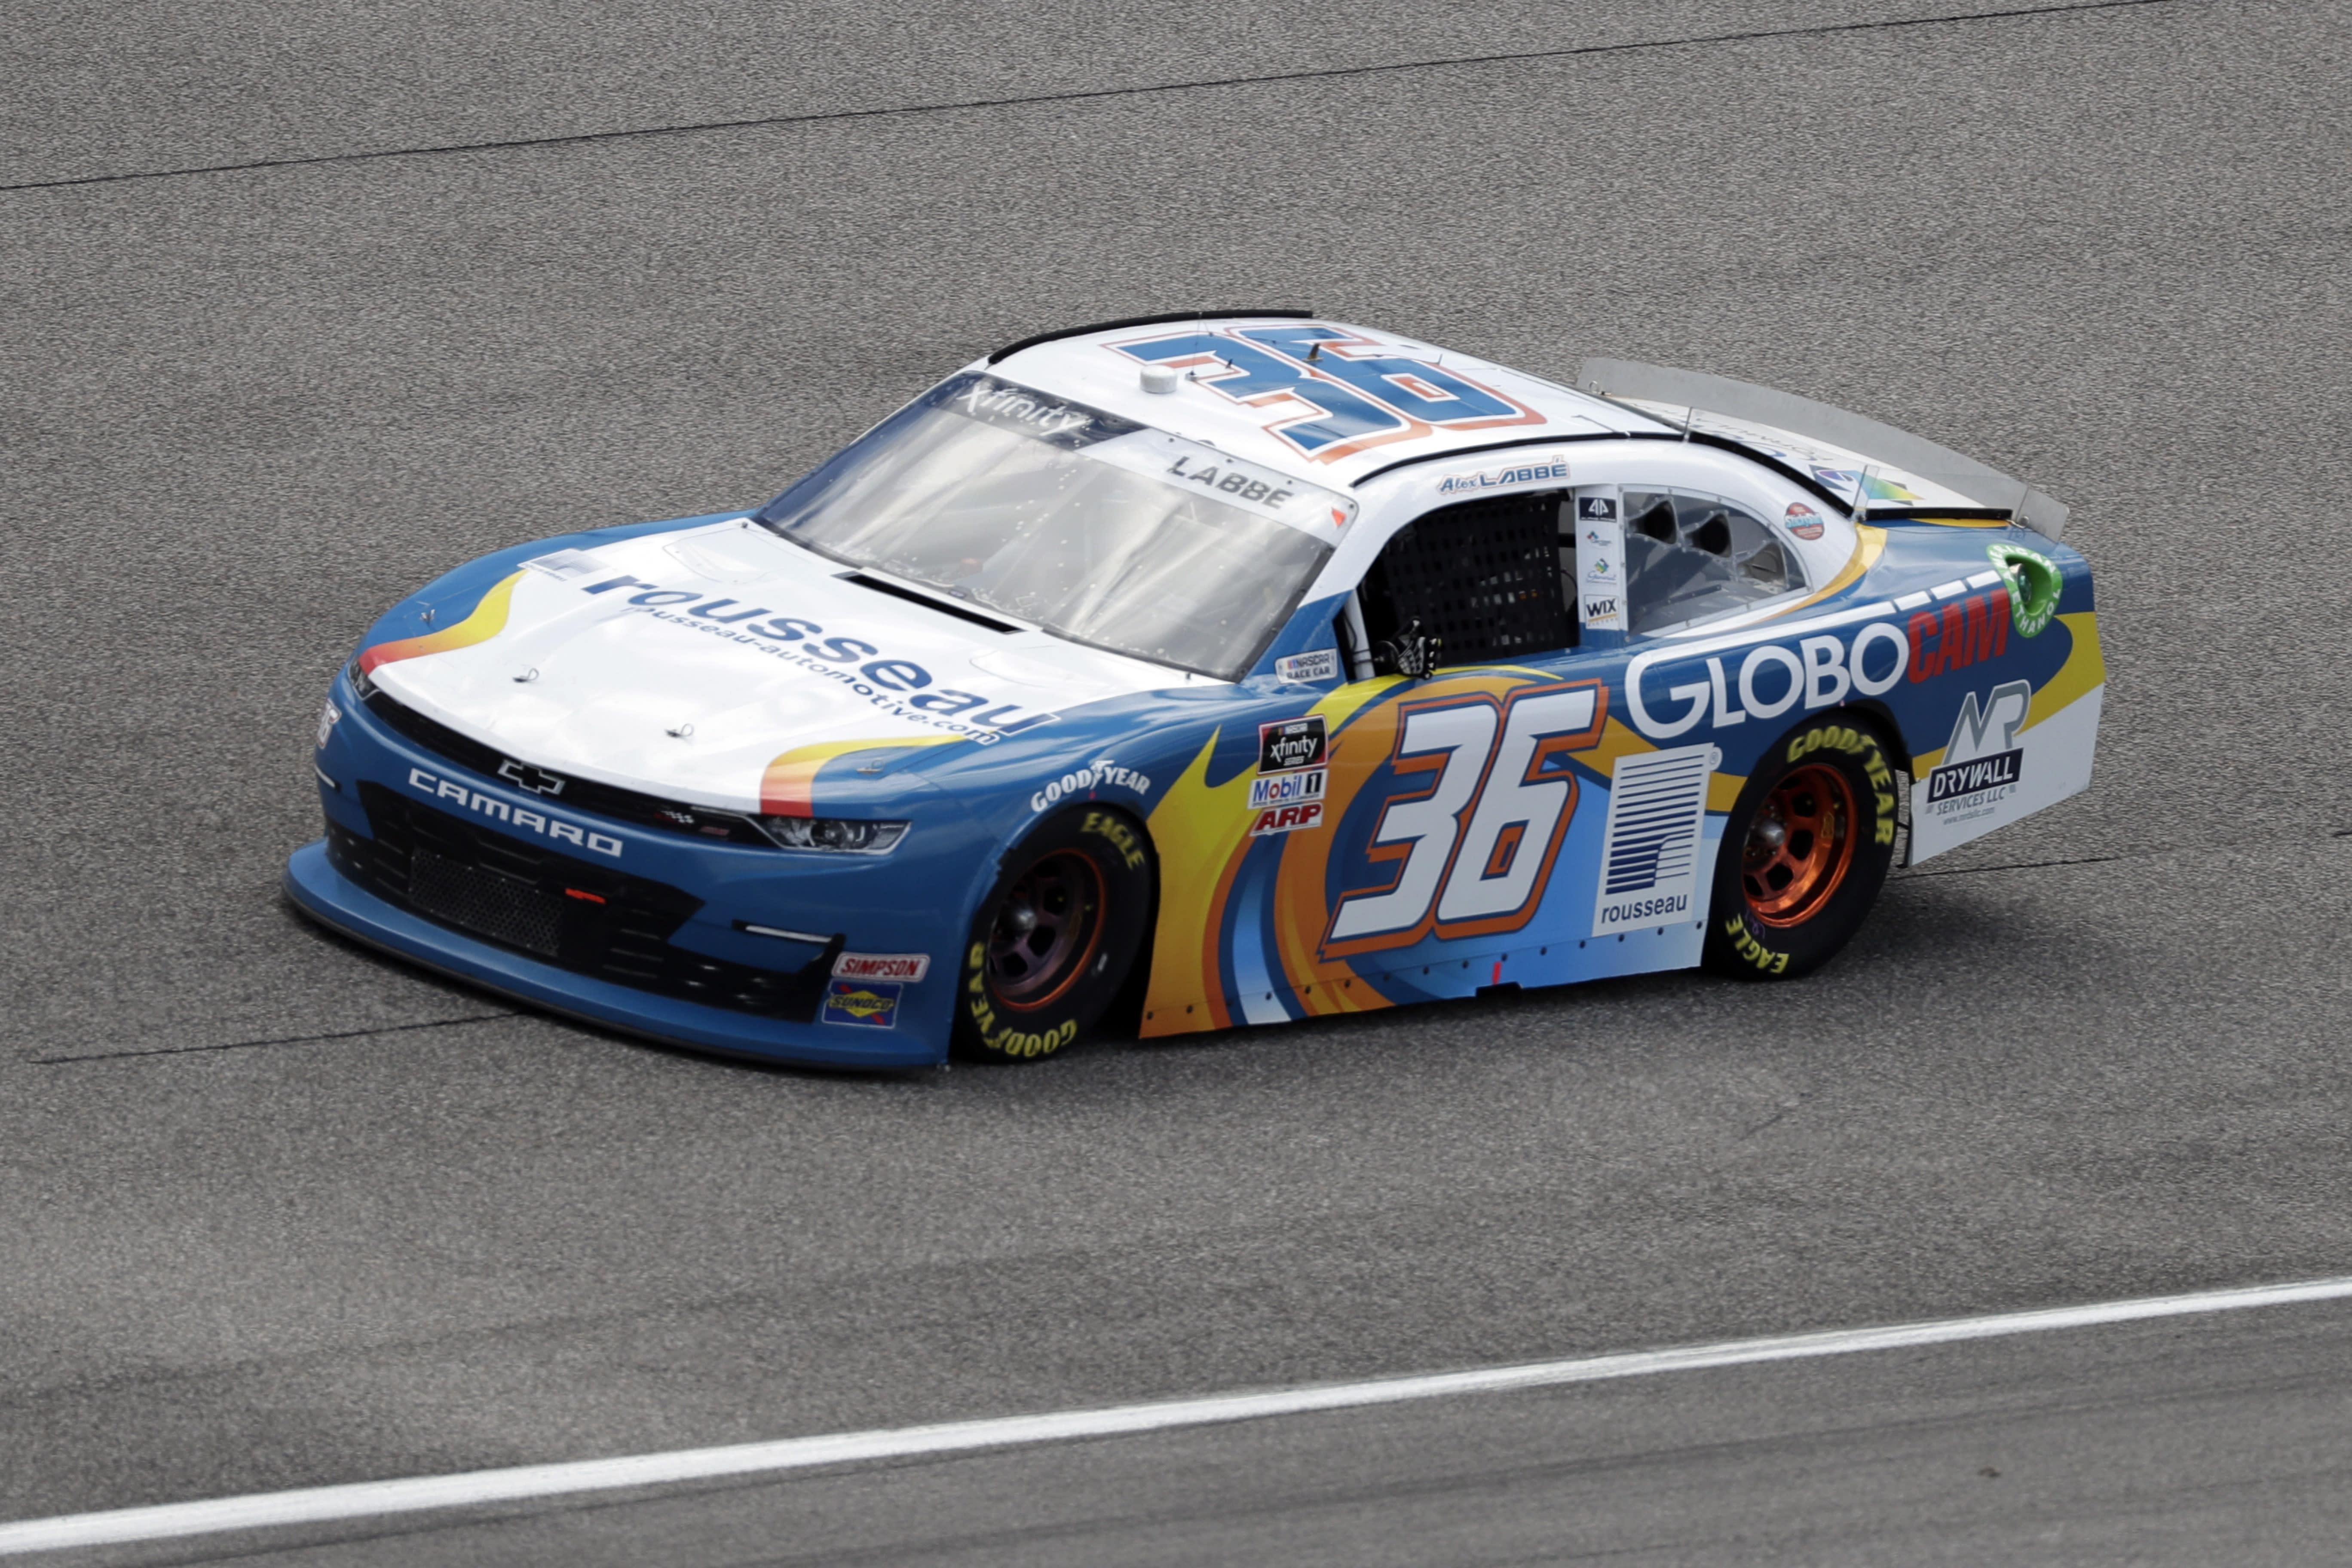 NASCAR penalizes Xfinity team for illegal test at Daytona